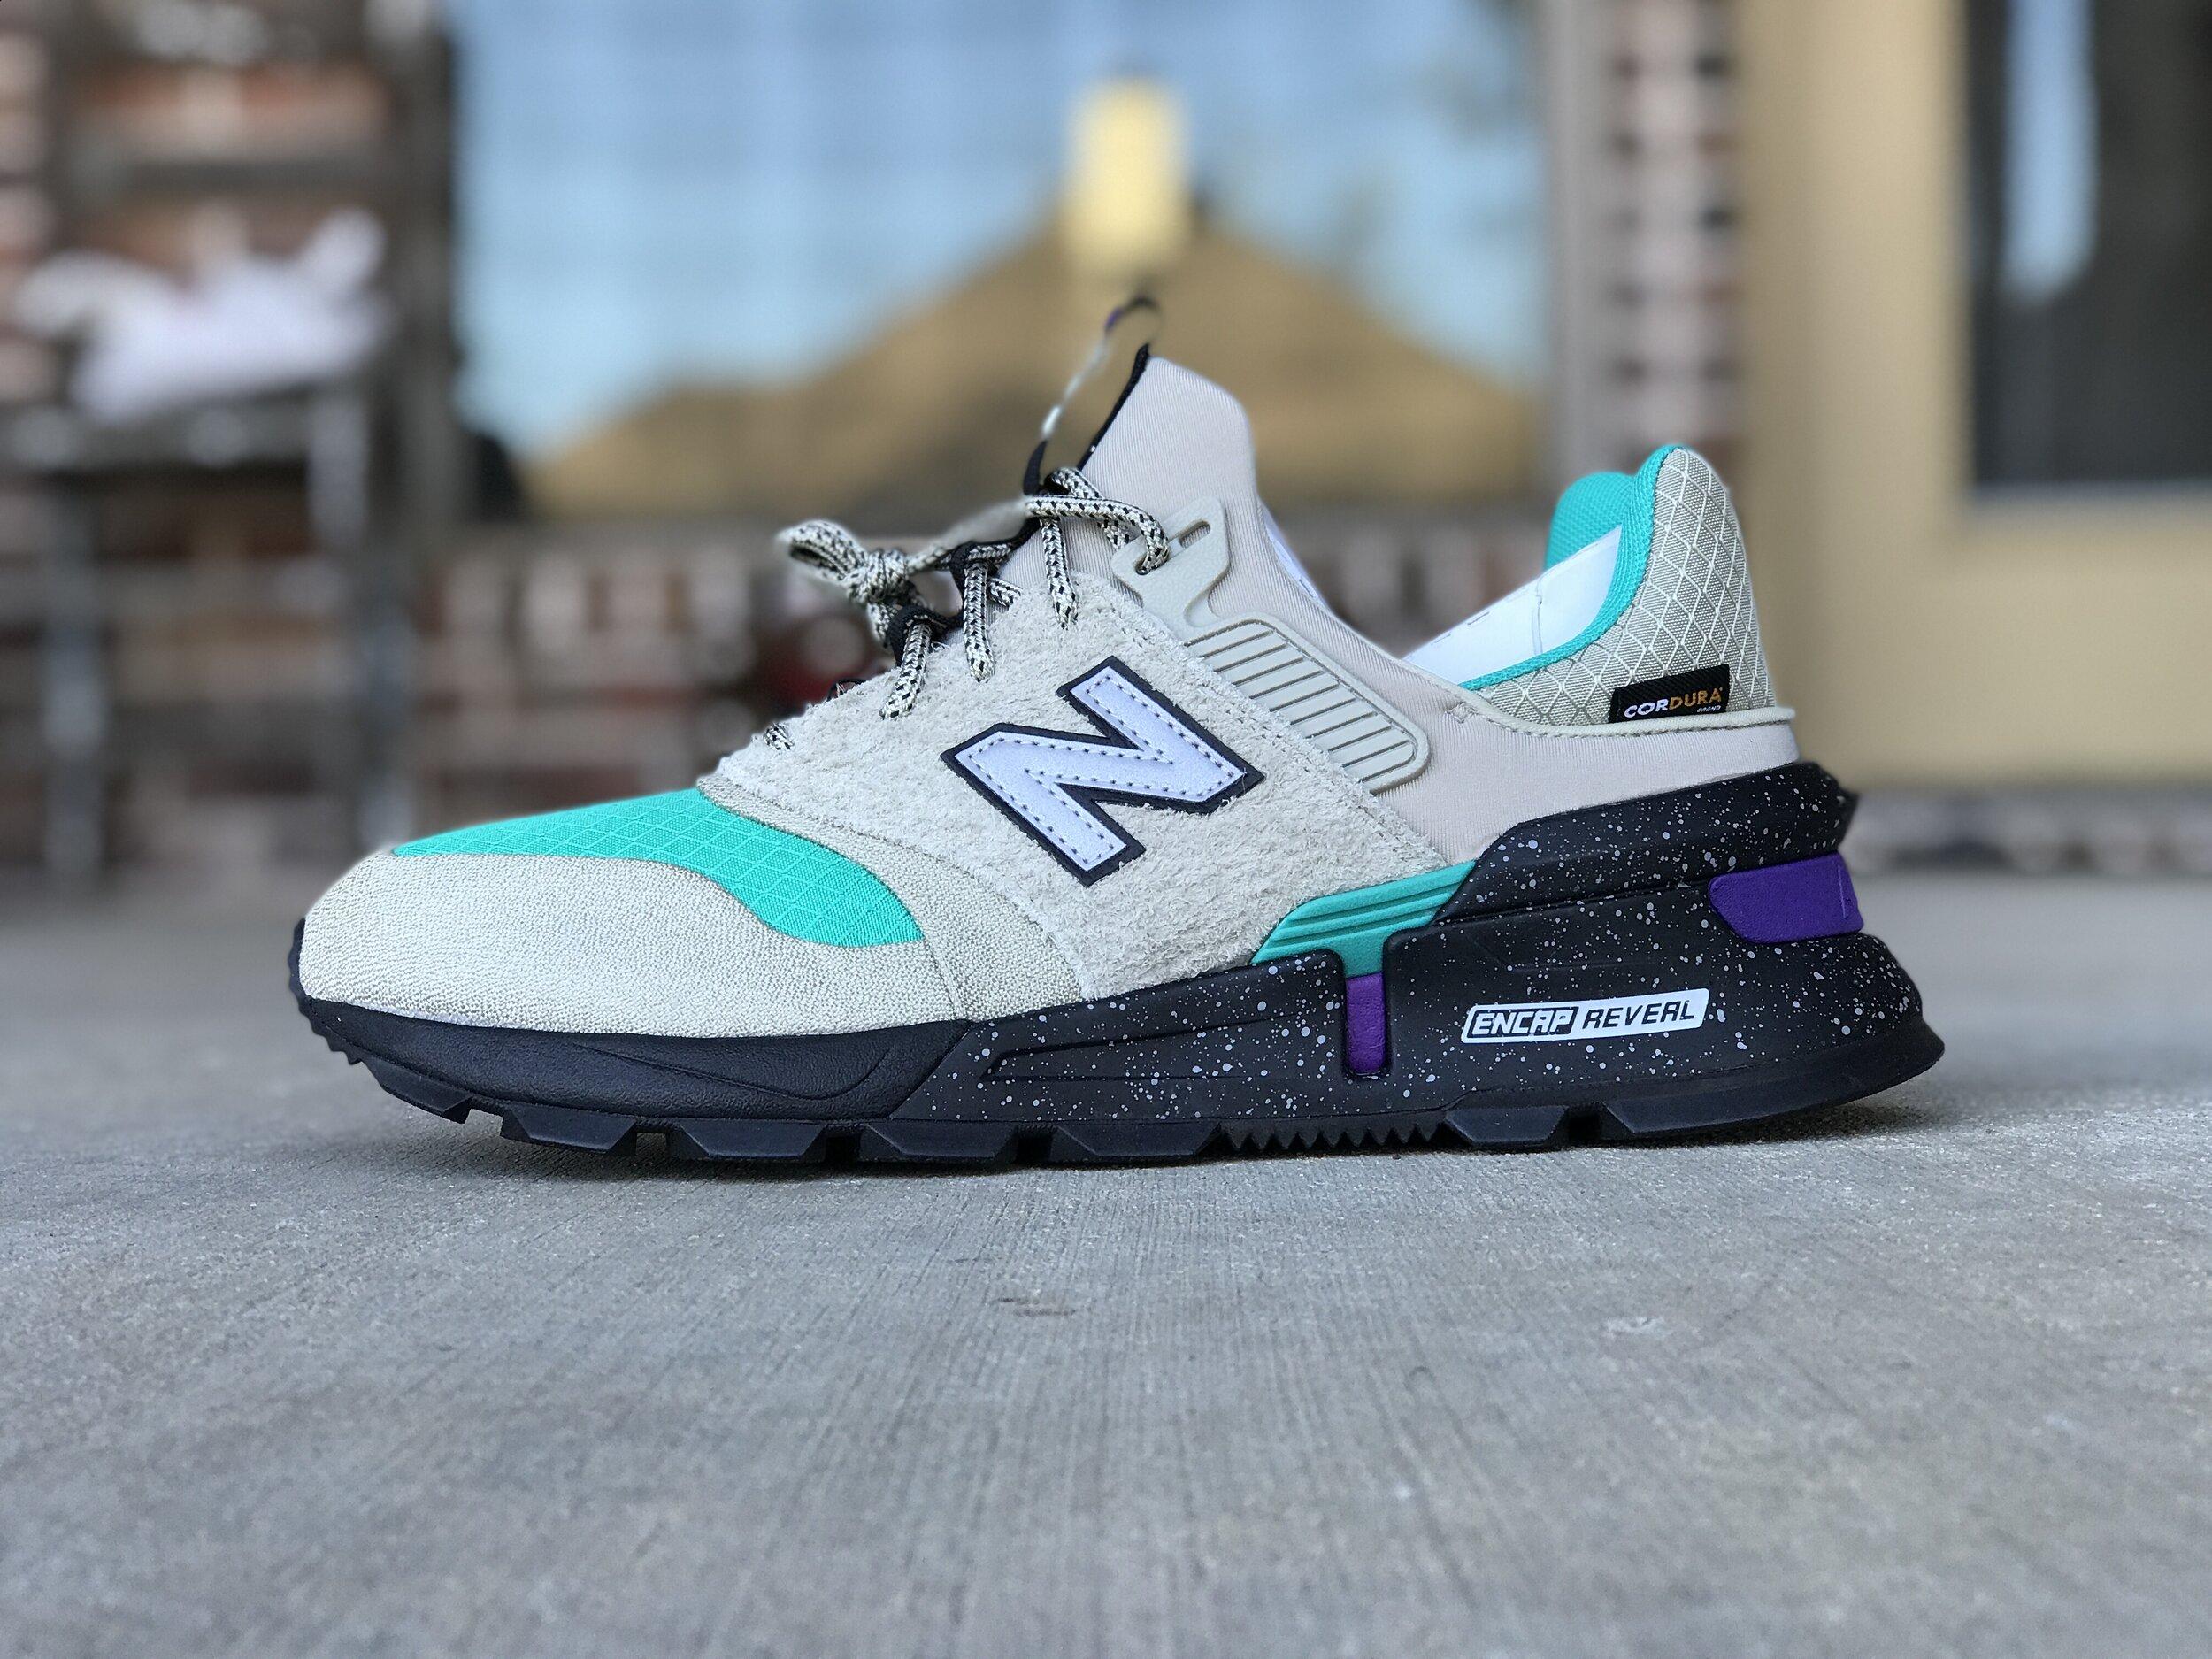 new balance cordura 997s